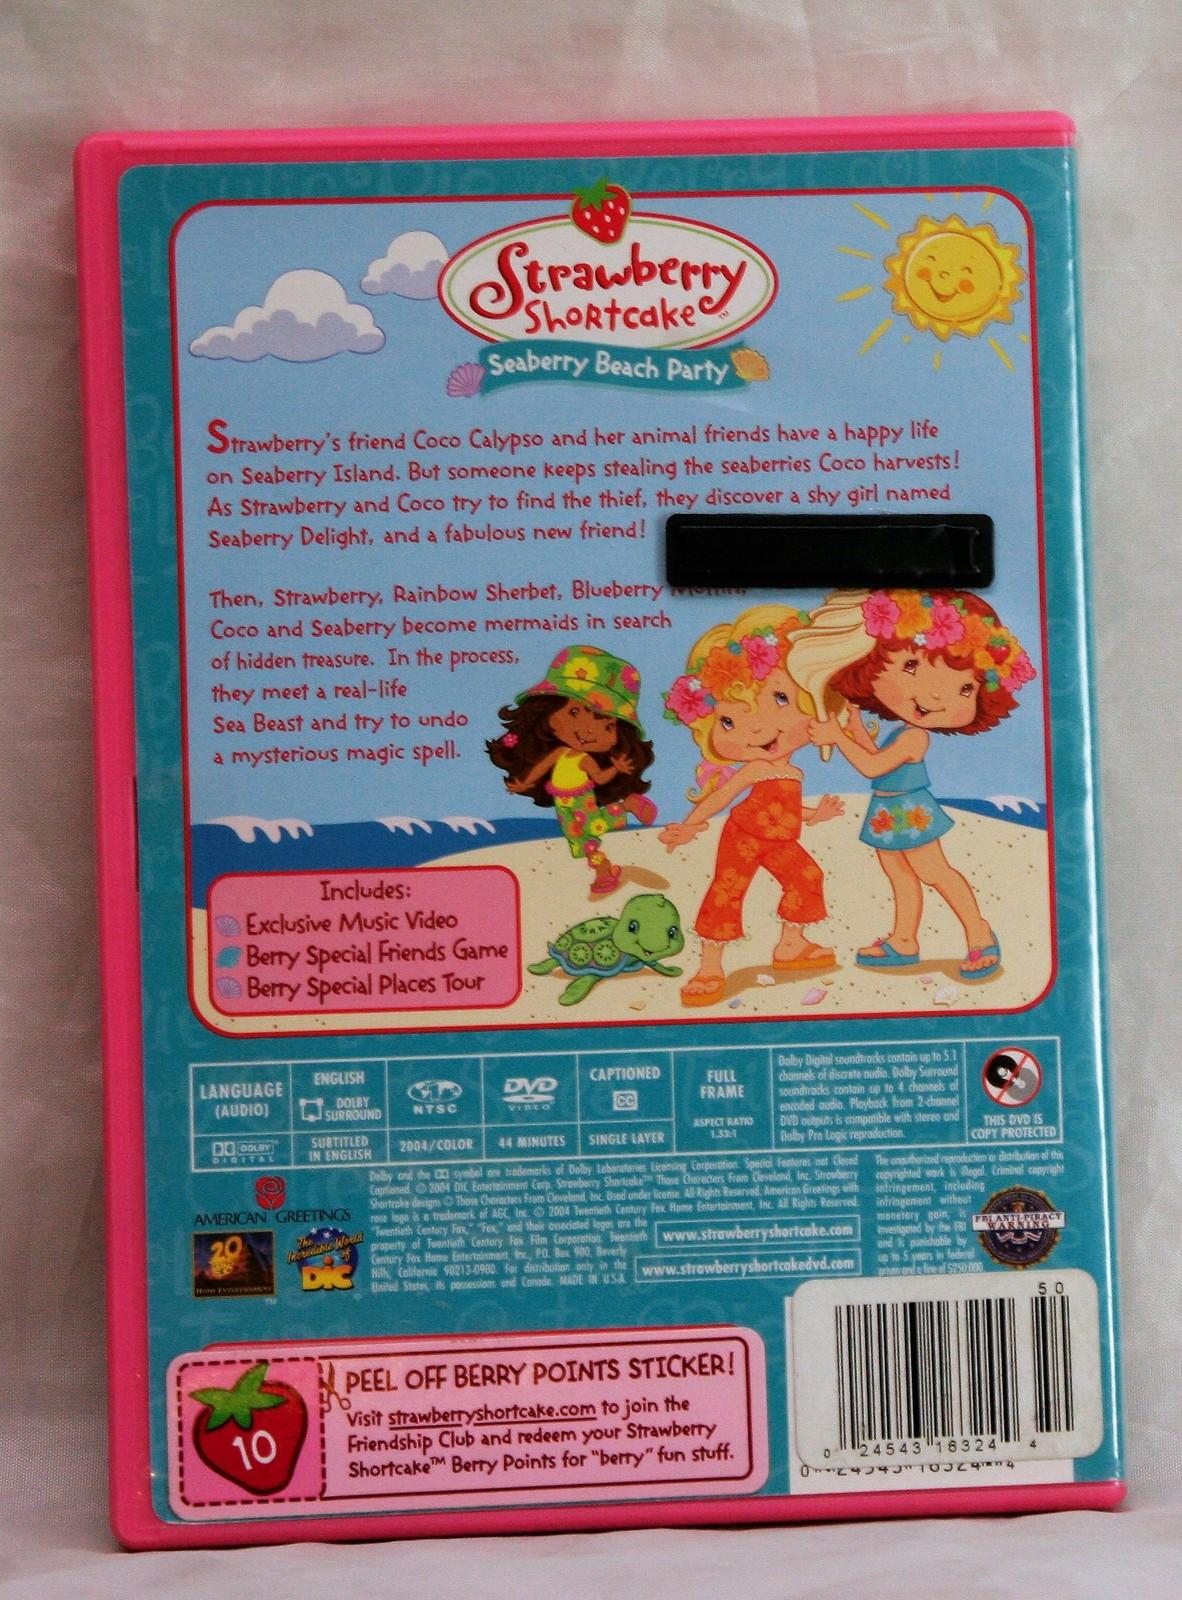 Strawberry Shortcake - Seaberry Beach Party (DVD, 2005)